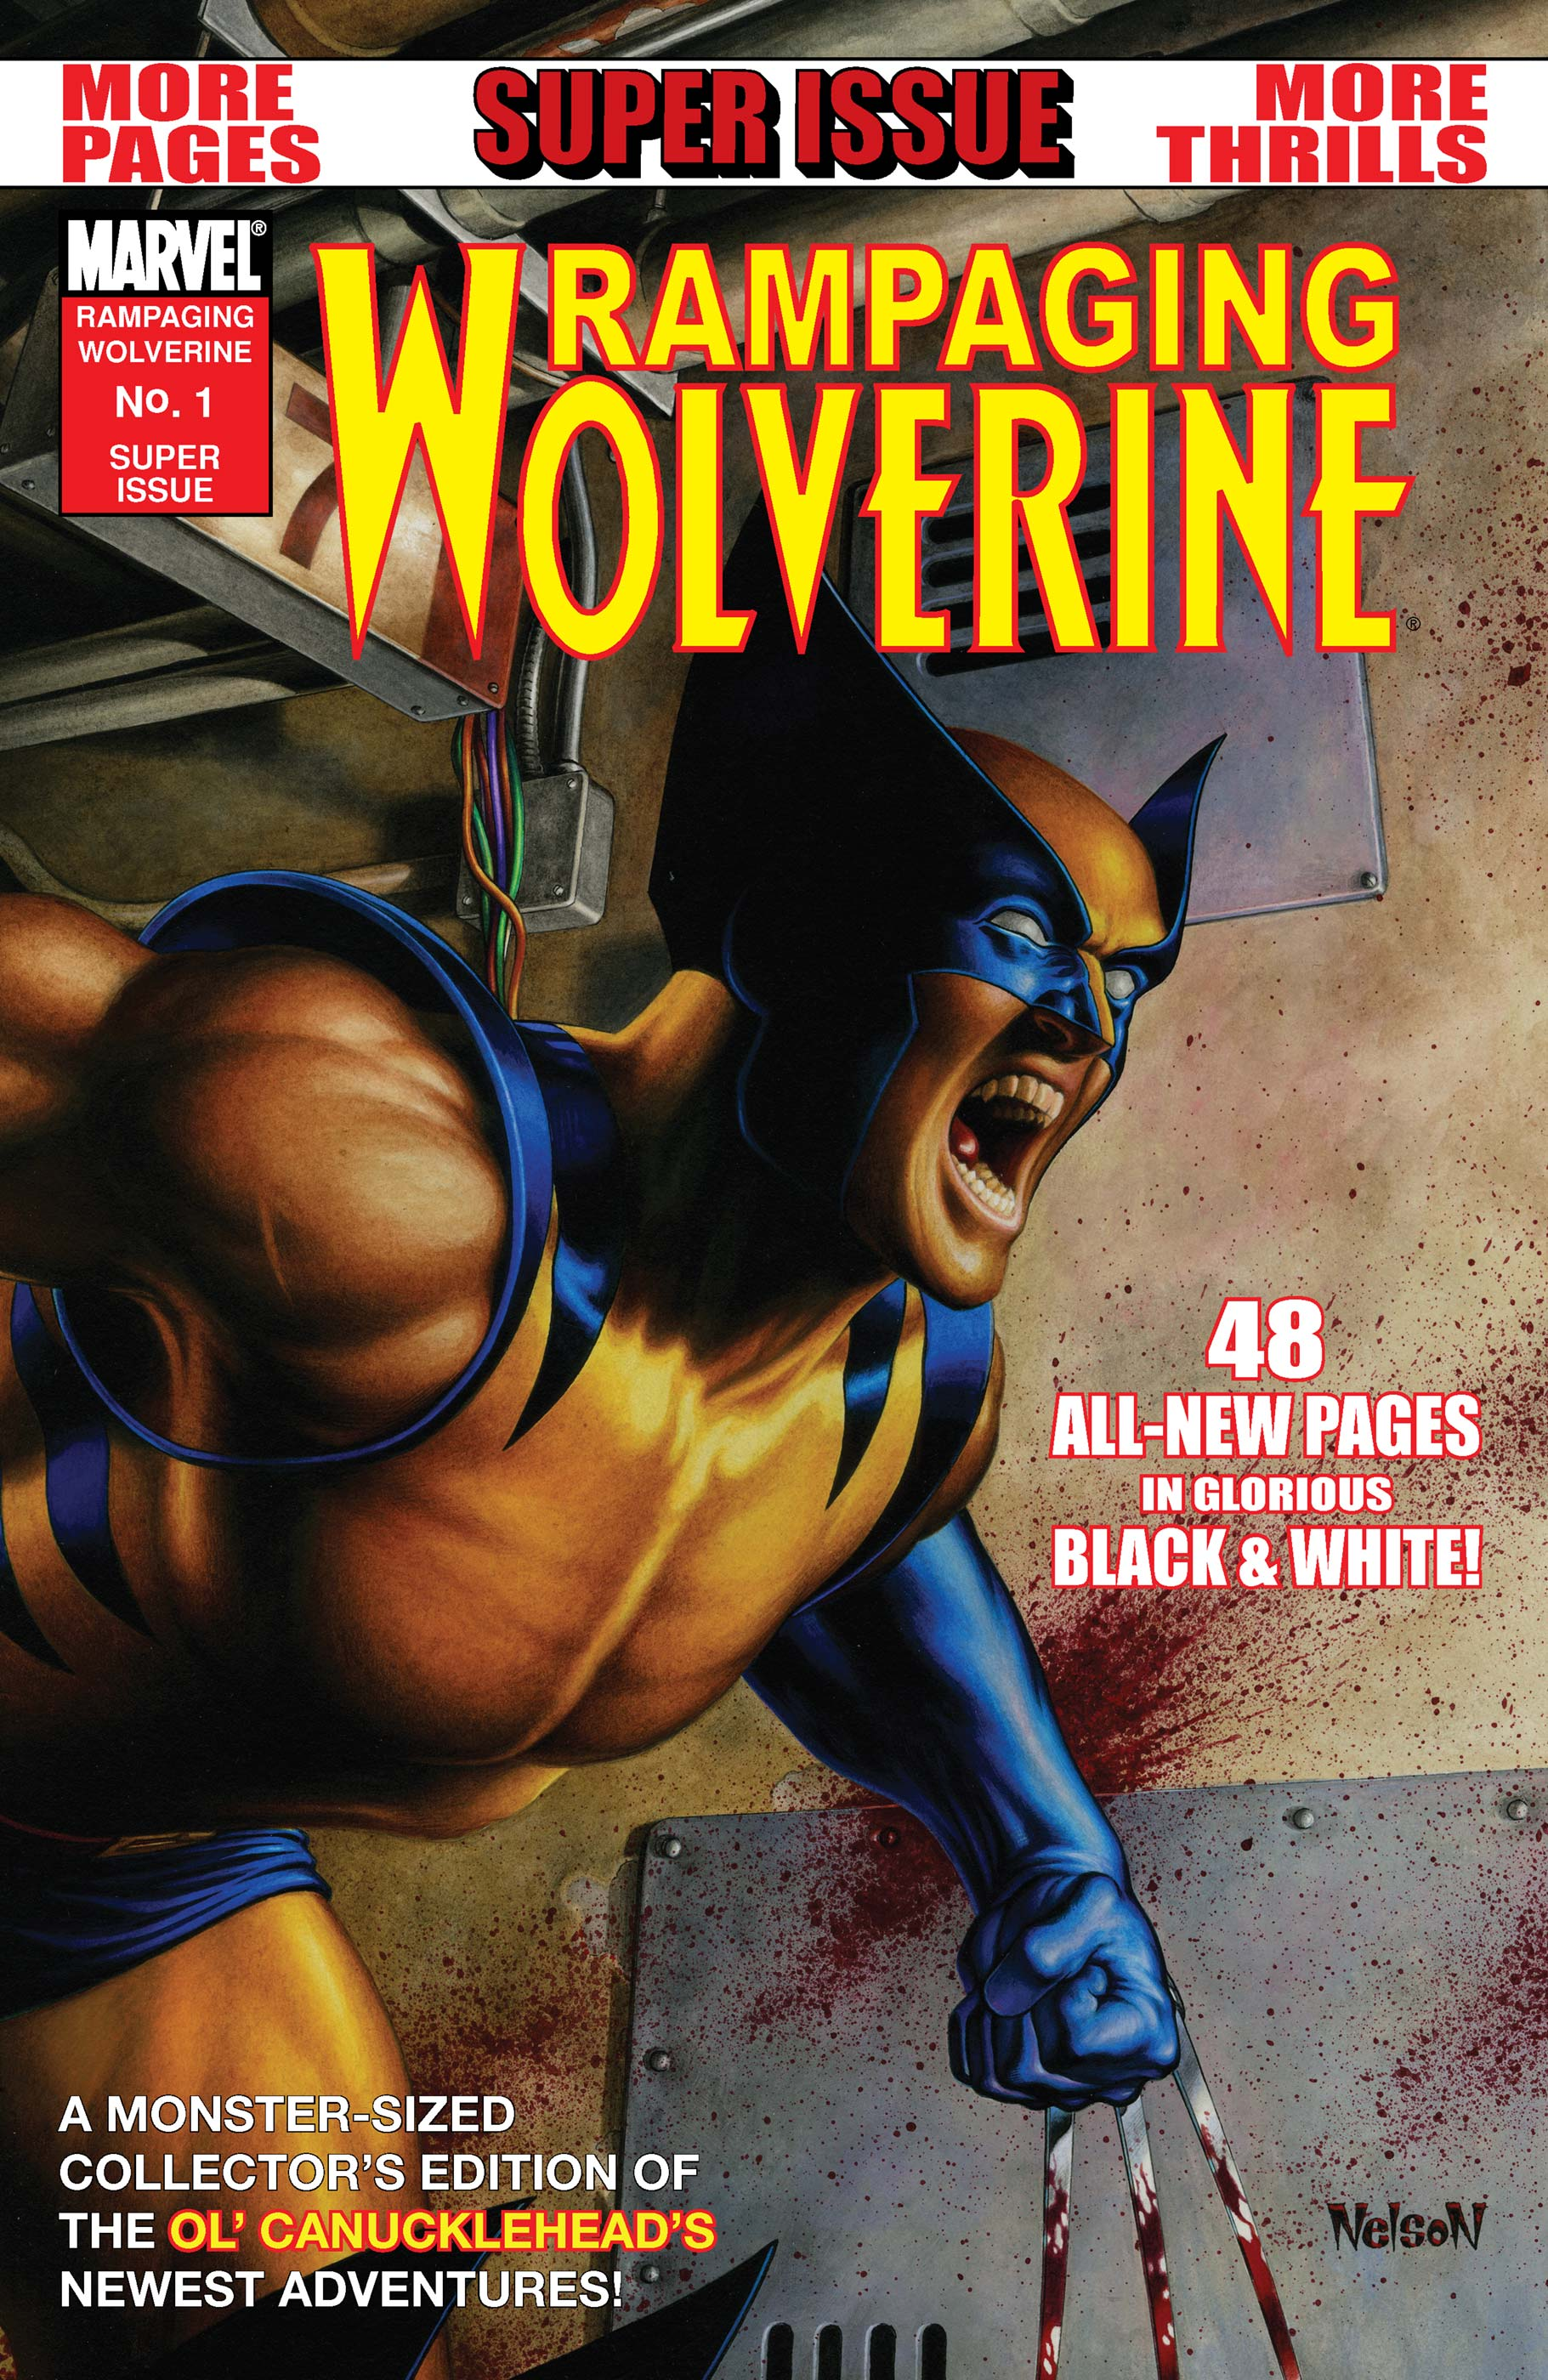 Rampaging Wolverine (2009) #1